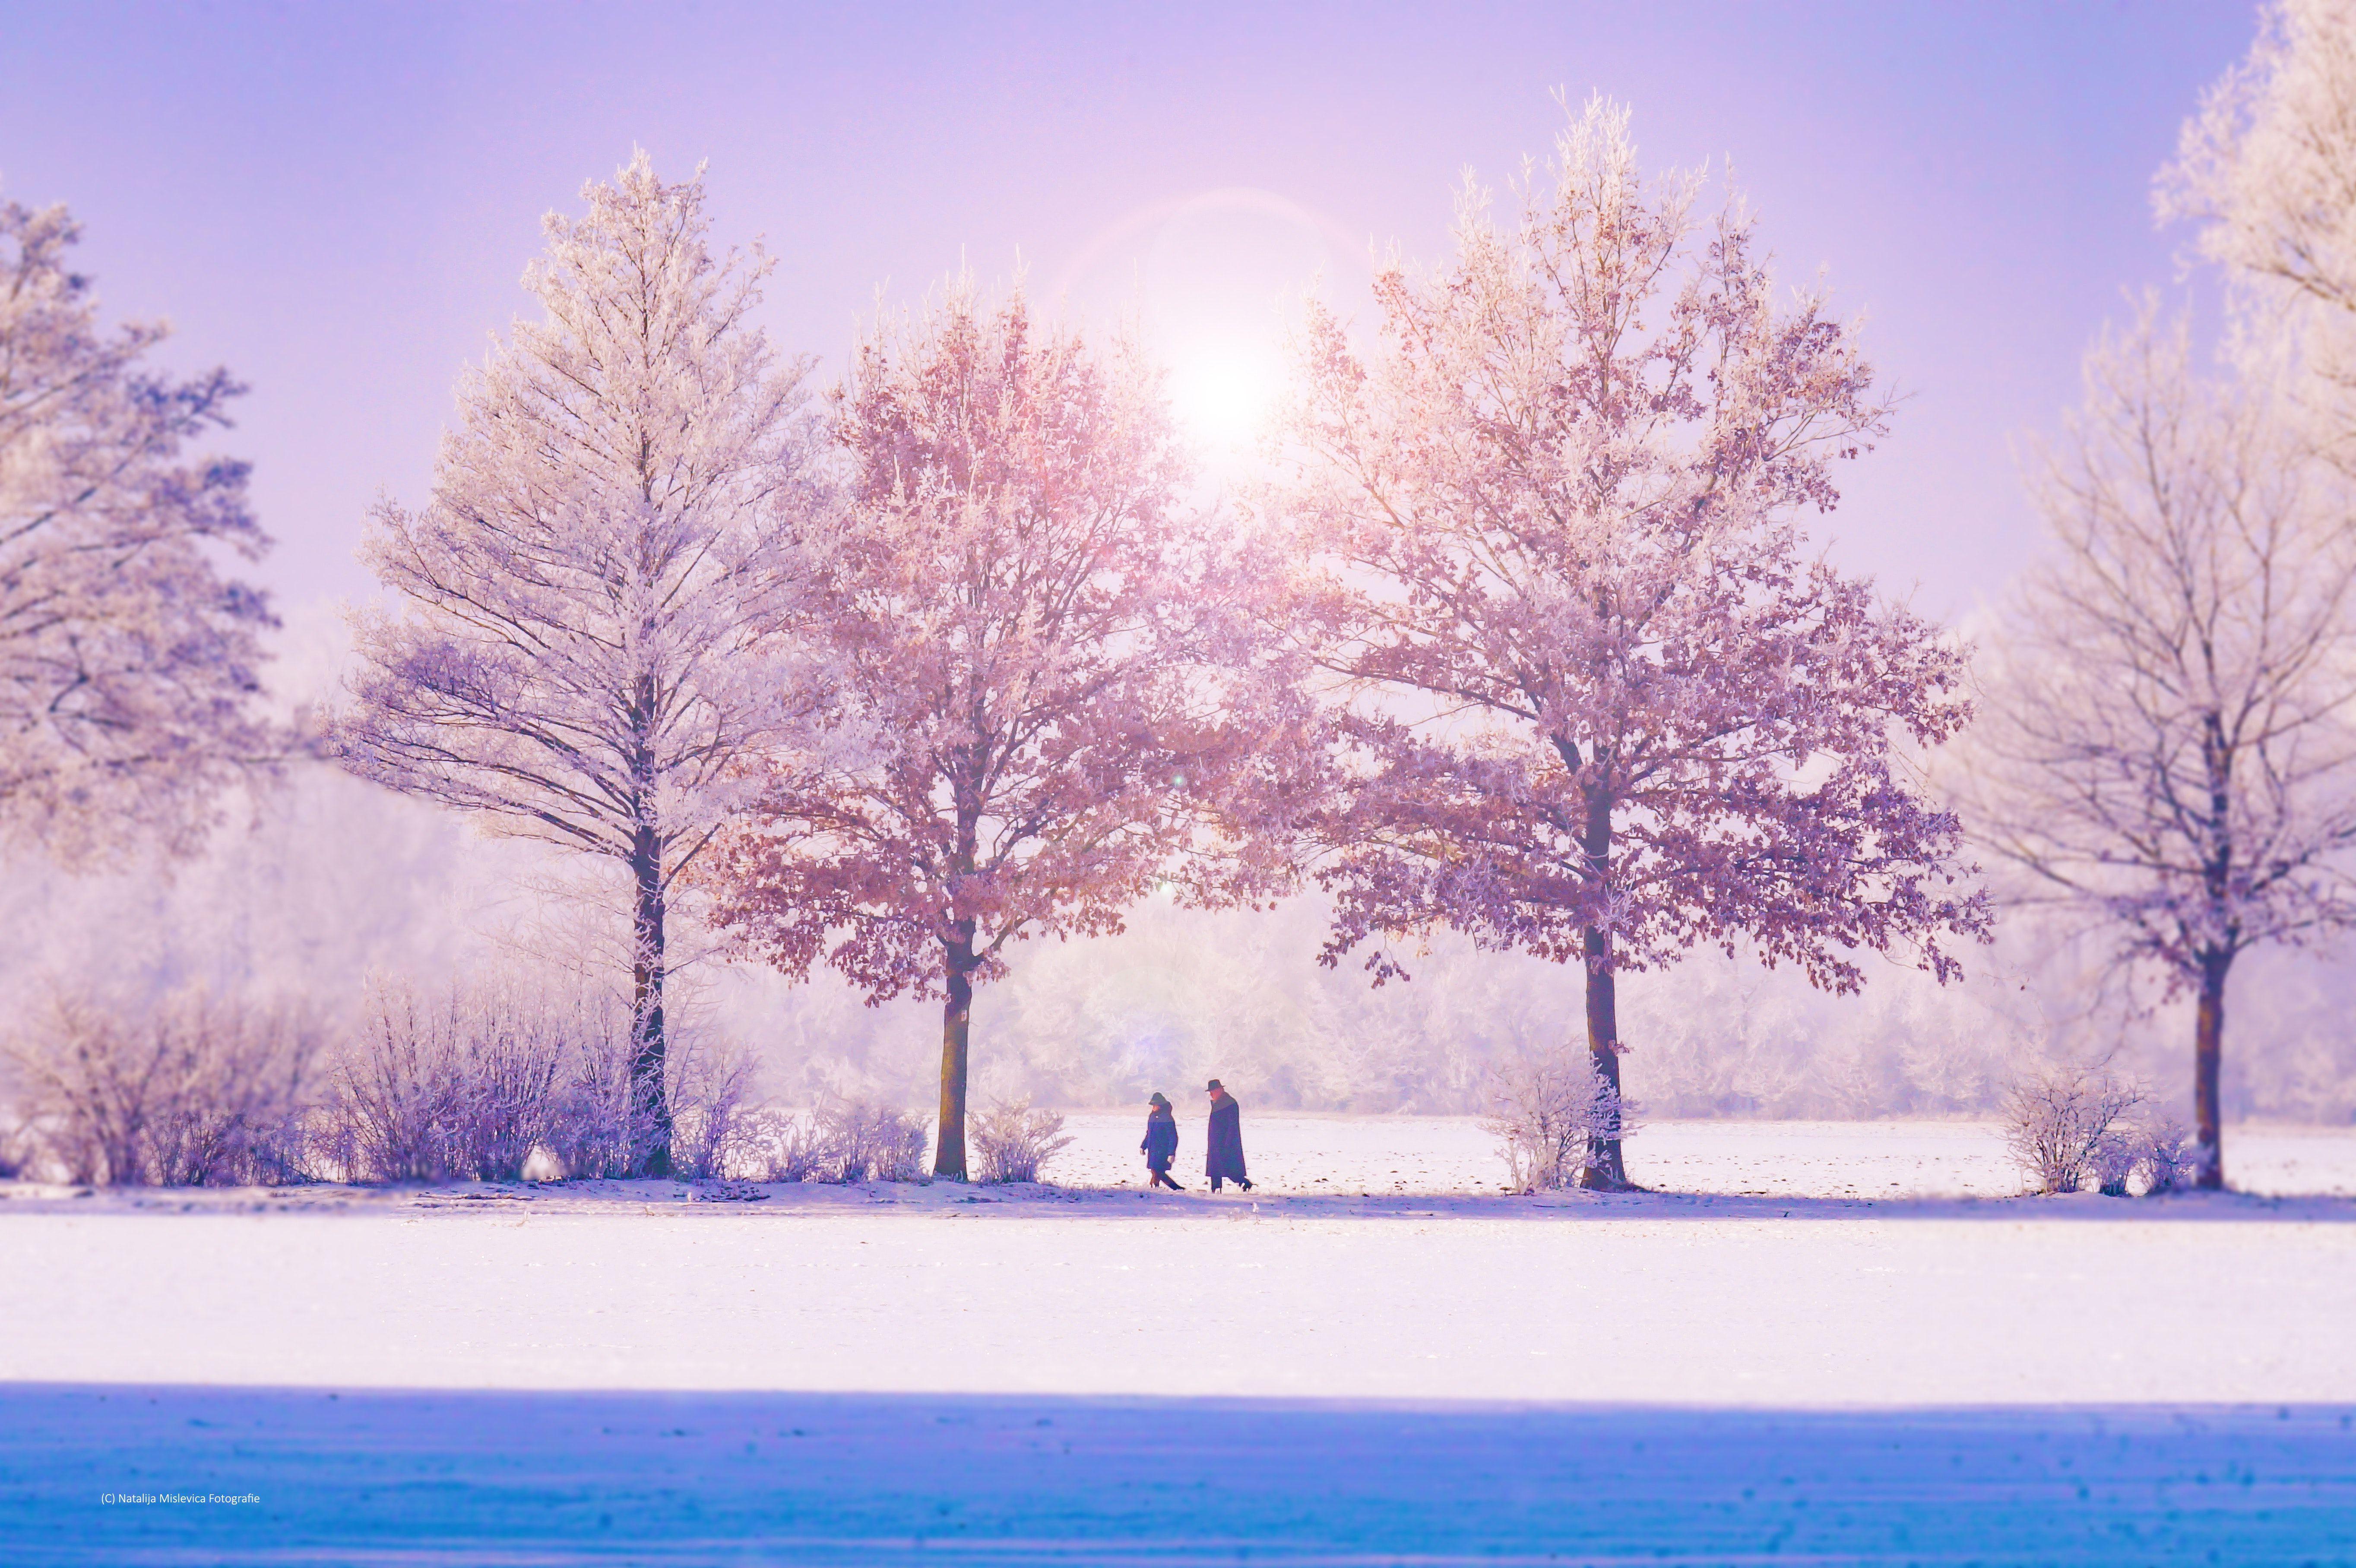 Pin By Julia Akter On Winter Nature Winter Wallpaper Winter Landscape Winter Trees